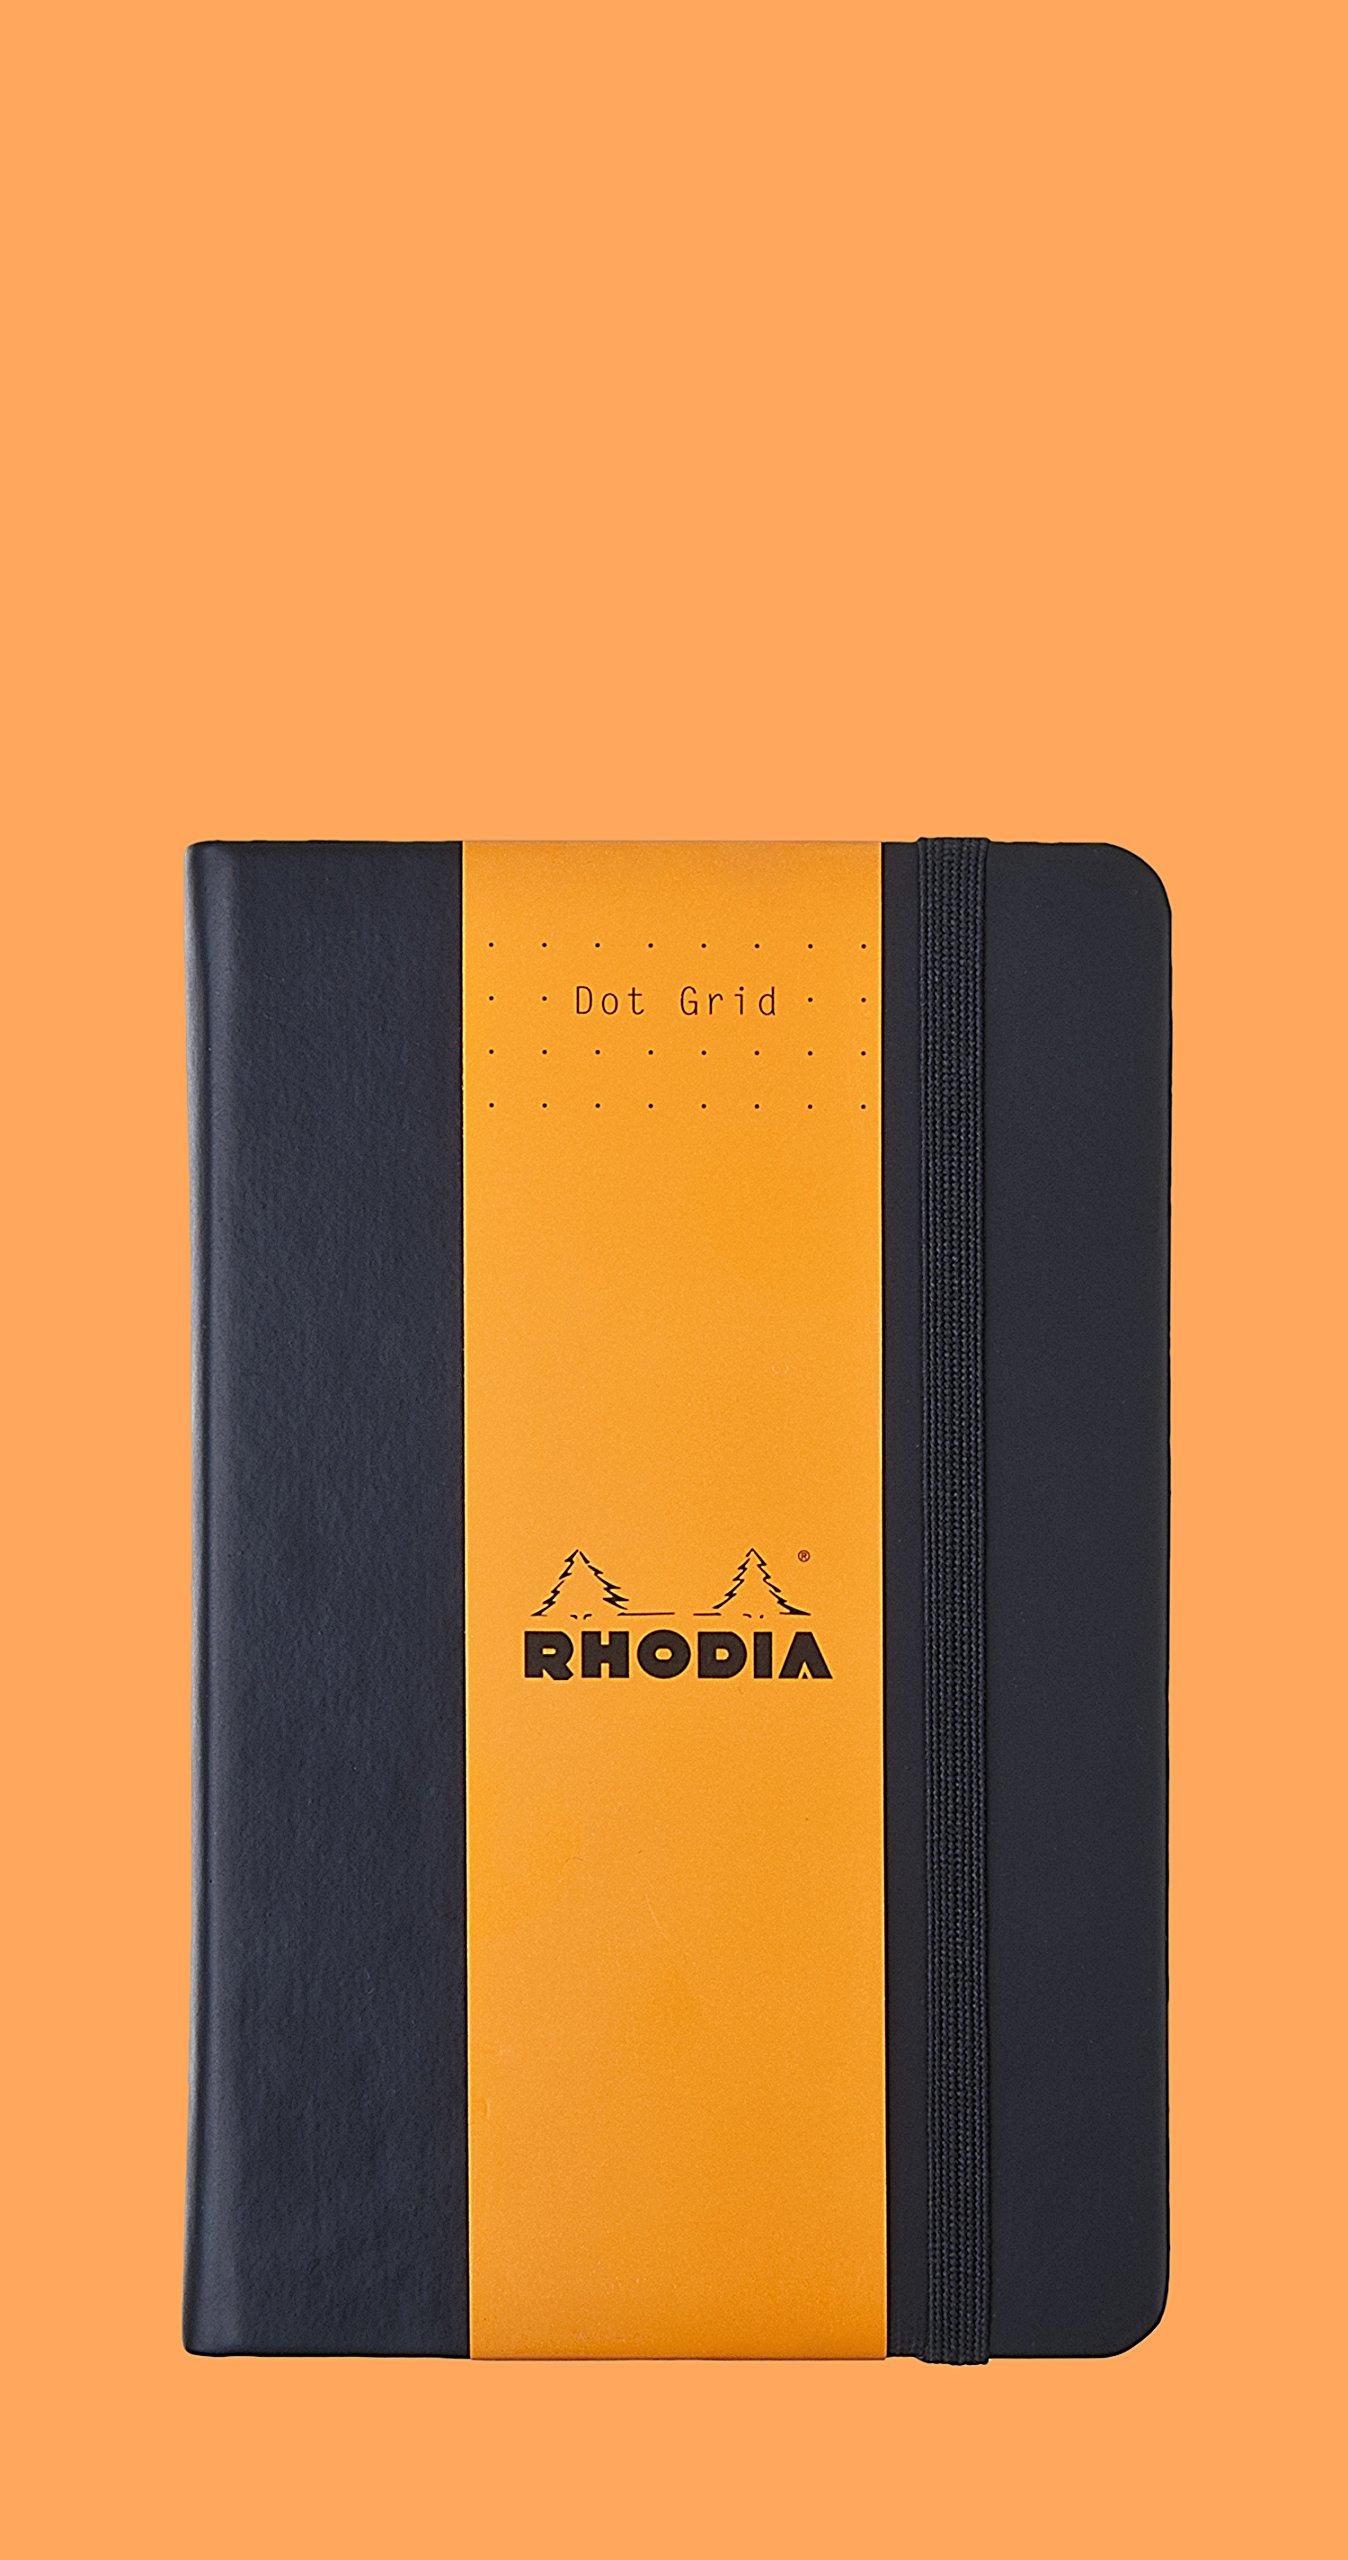 Rhodia Black Webnotebook 3.5X5.5 Dot Grid